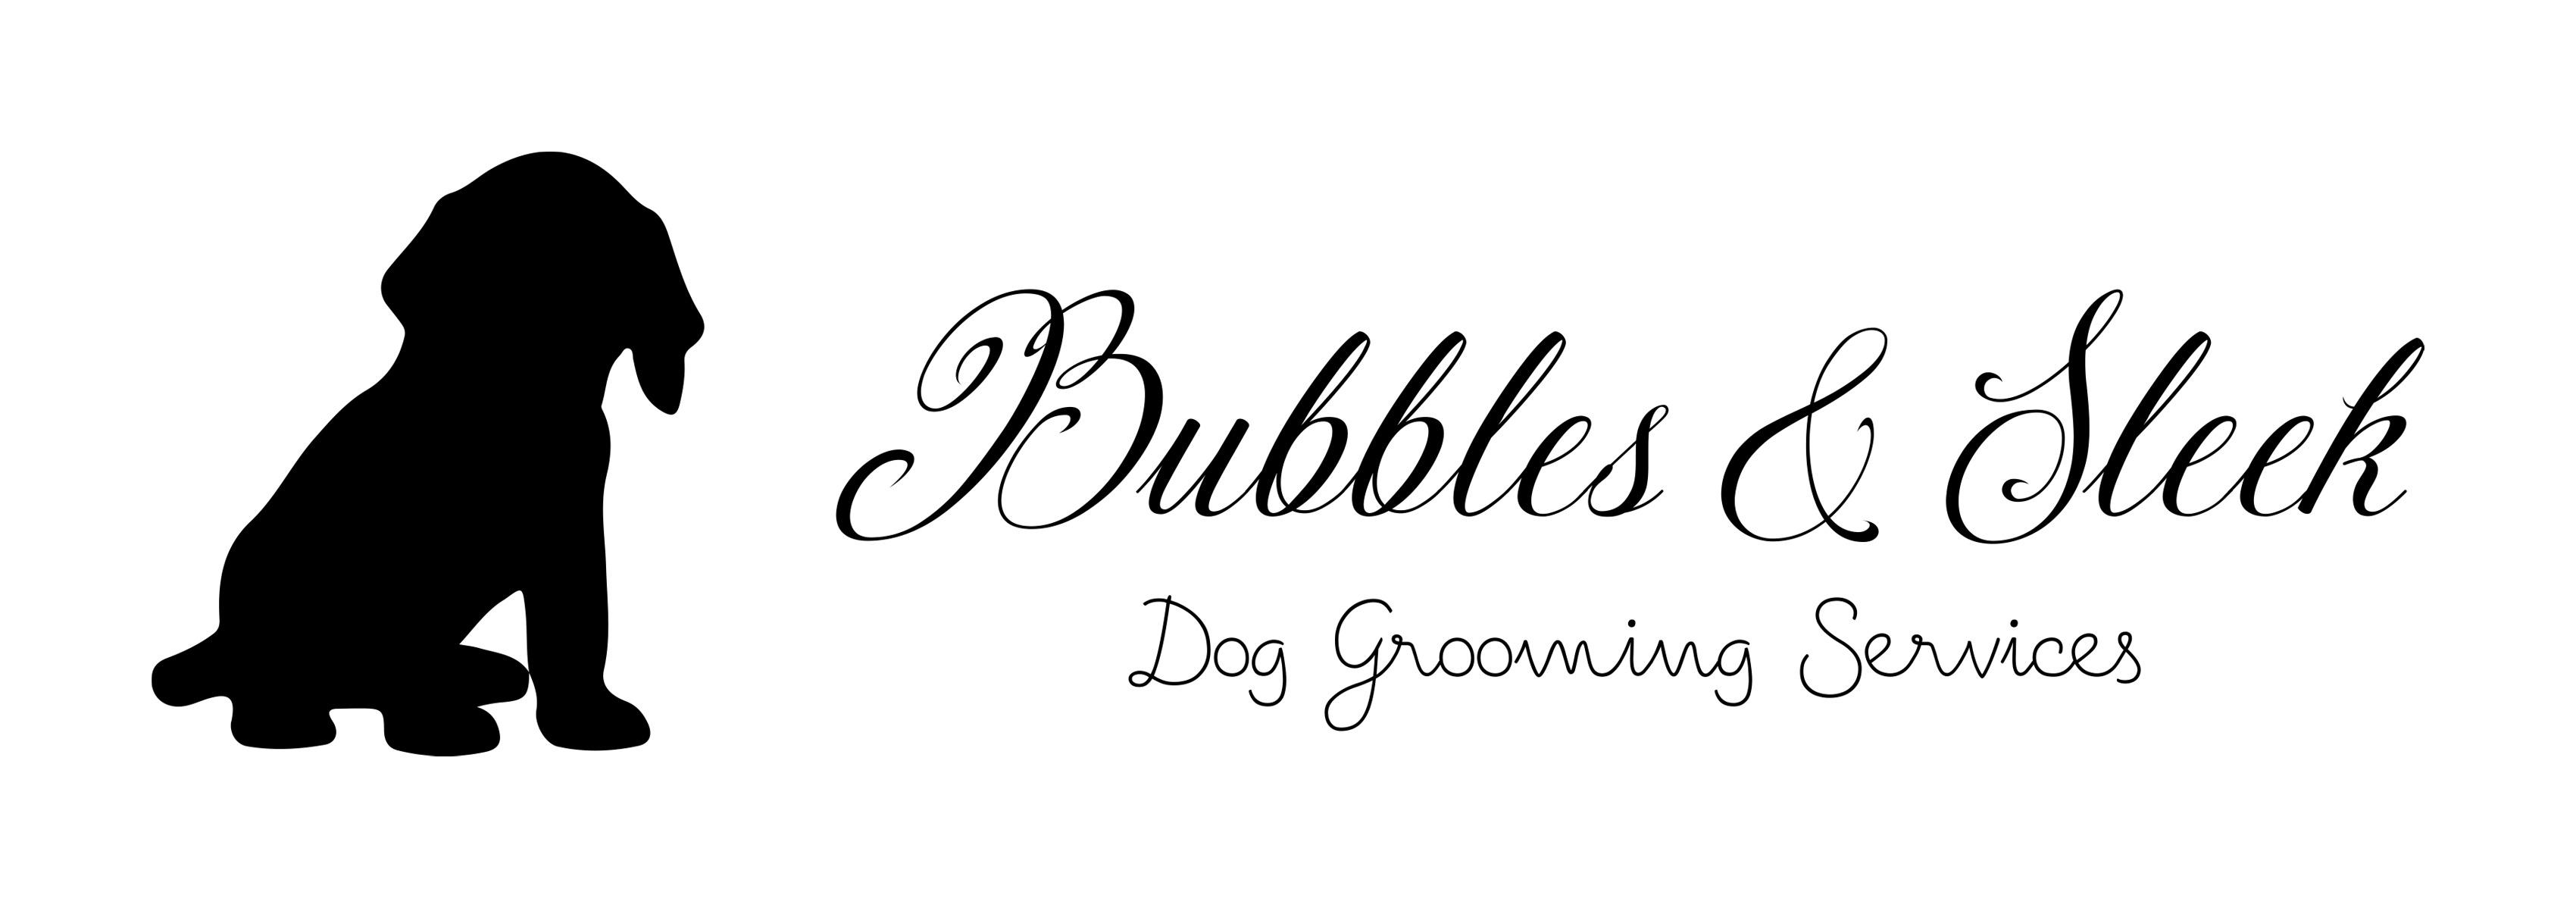 Bubbles and Sleek